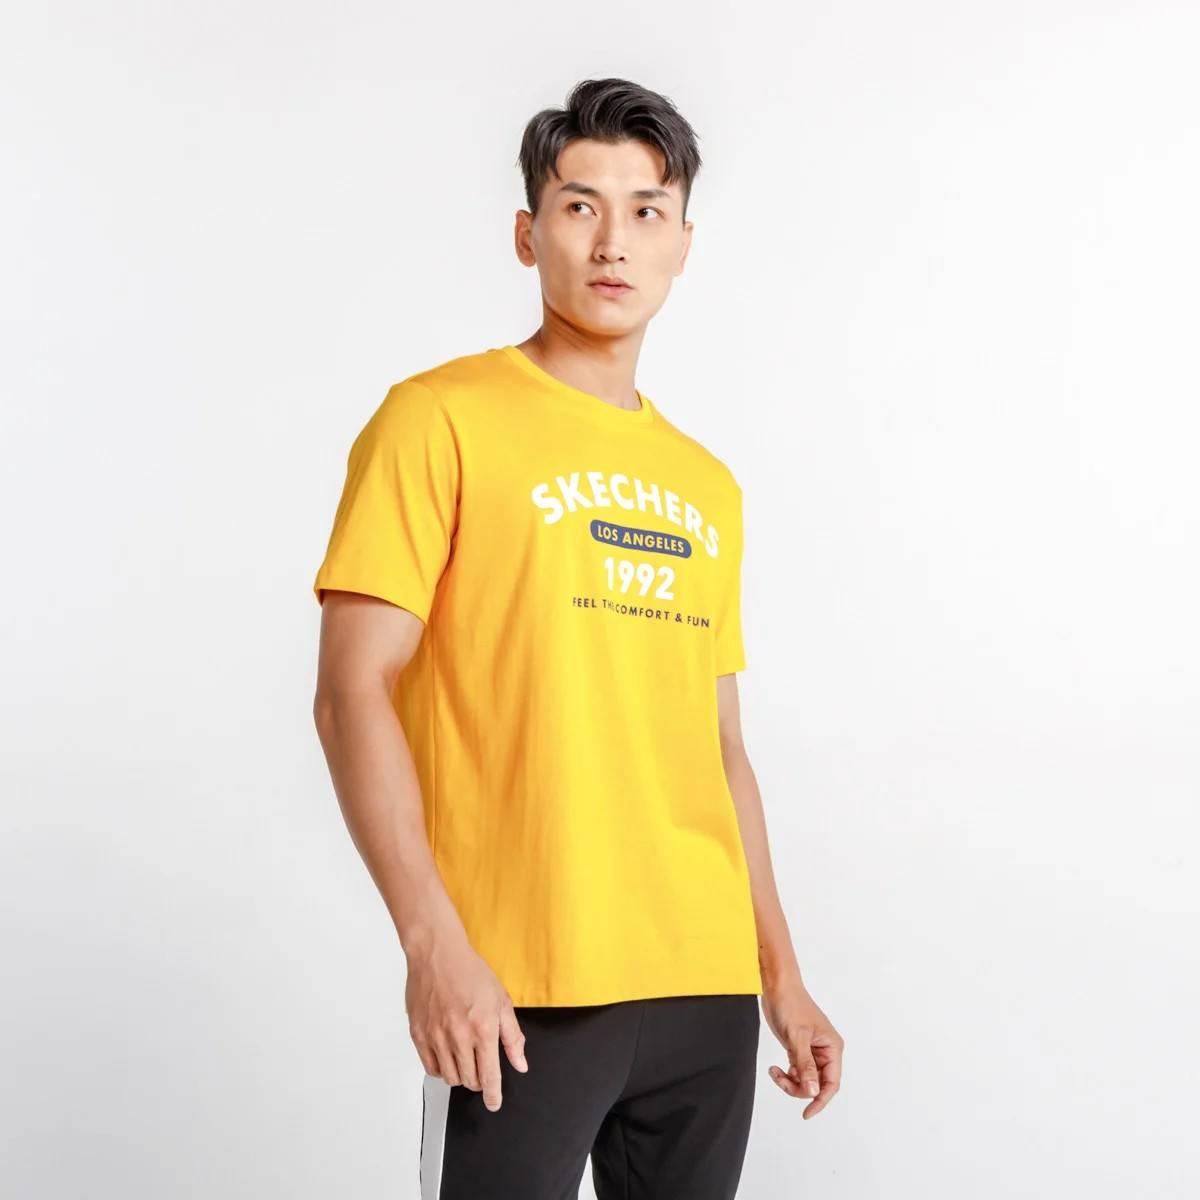 SKECHERS 斯凯奇 男士 运动T恤 *2件    90元包邮(折45元/件)